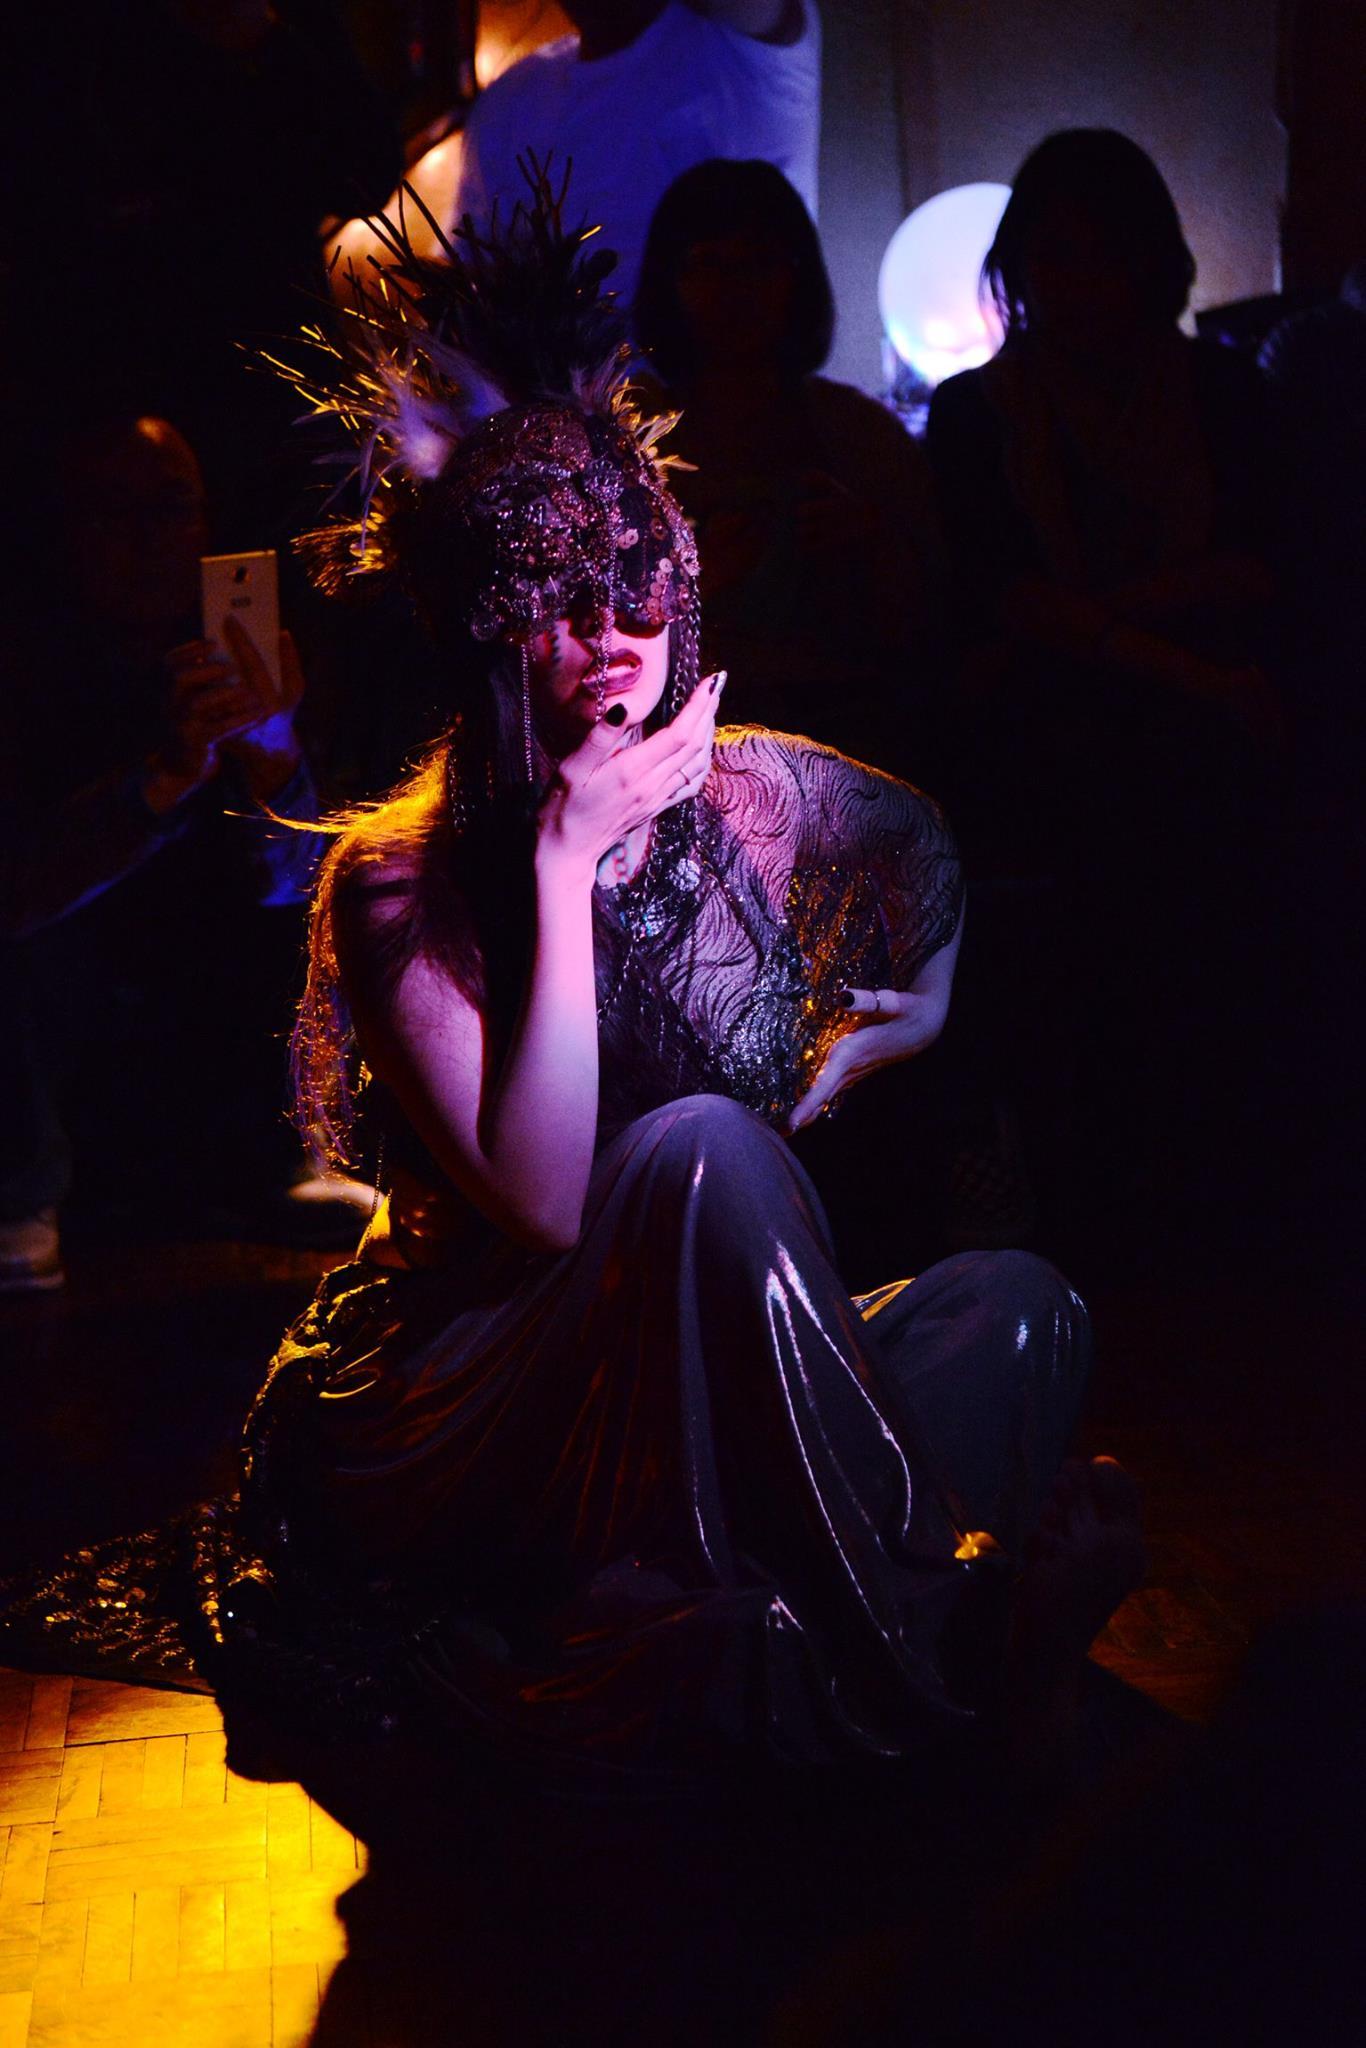 Photo by Makoto Fukuda